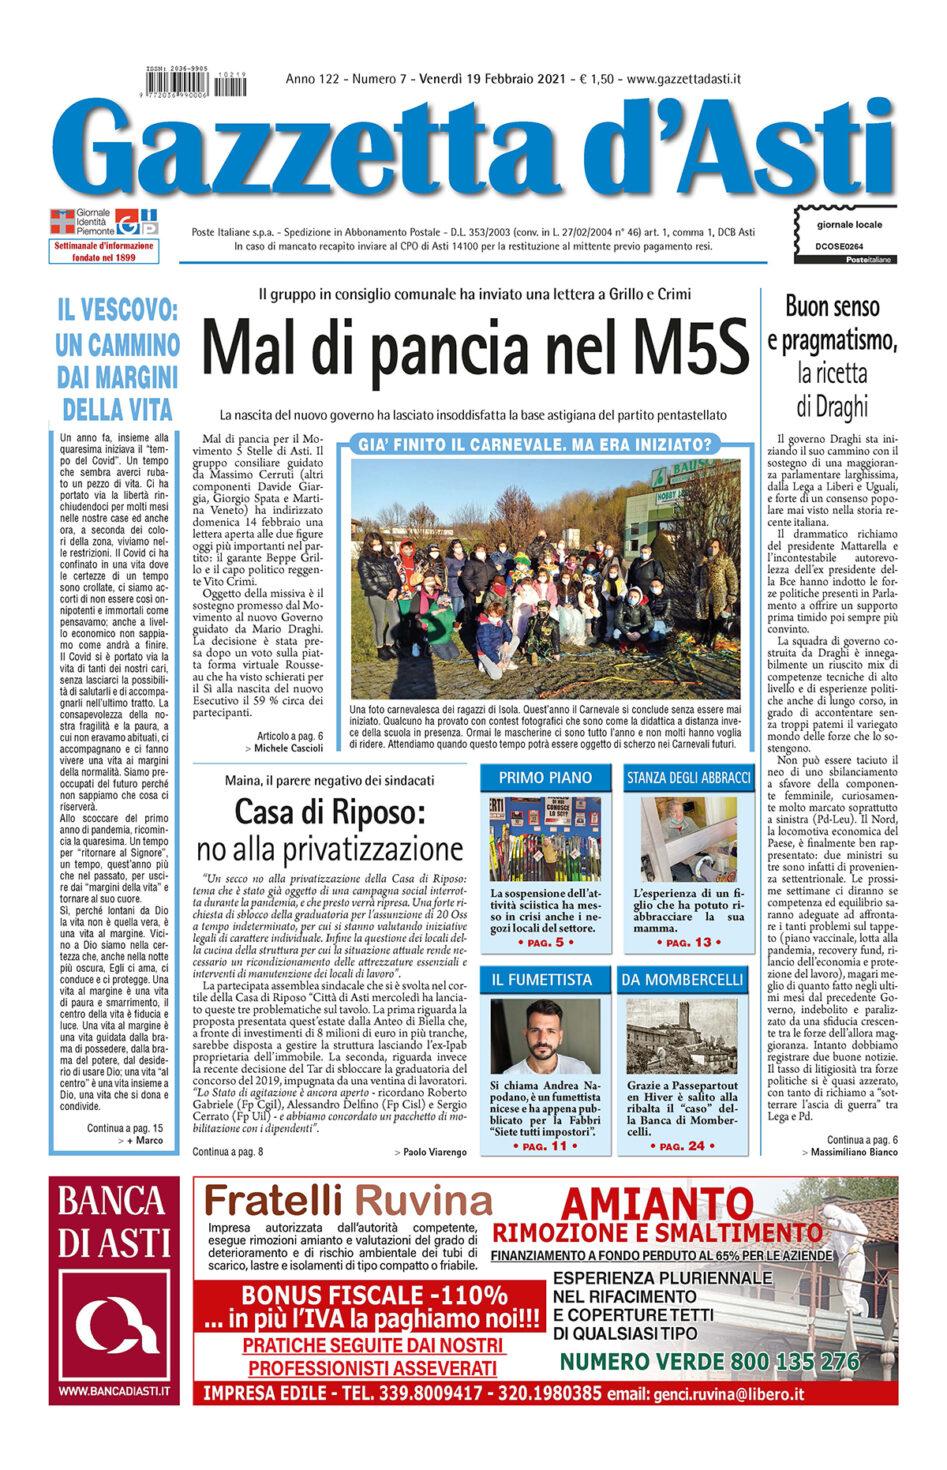 Pirma pagina – 19 febbraio 2021